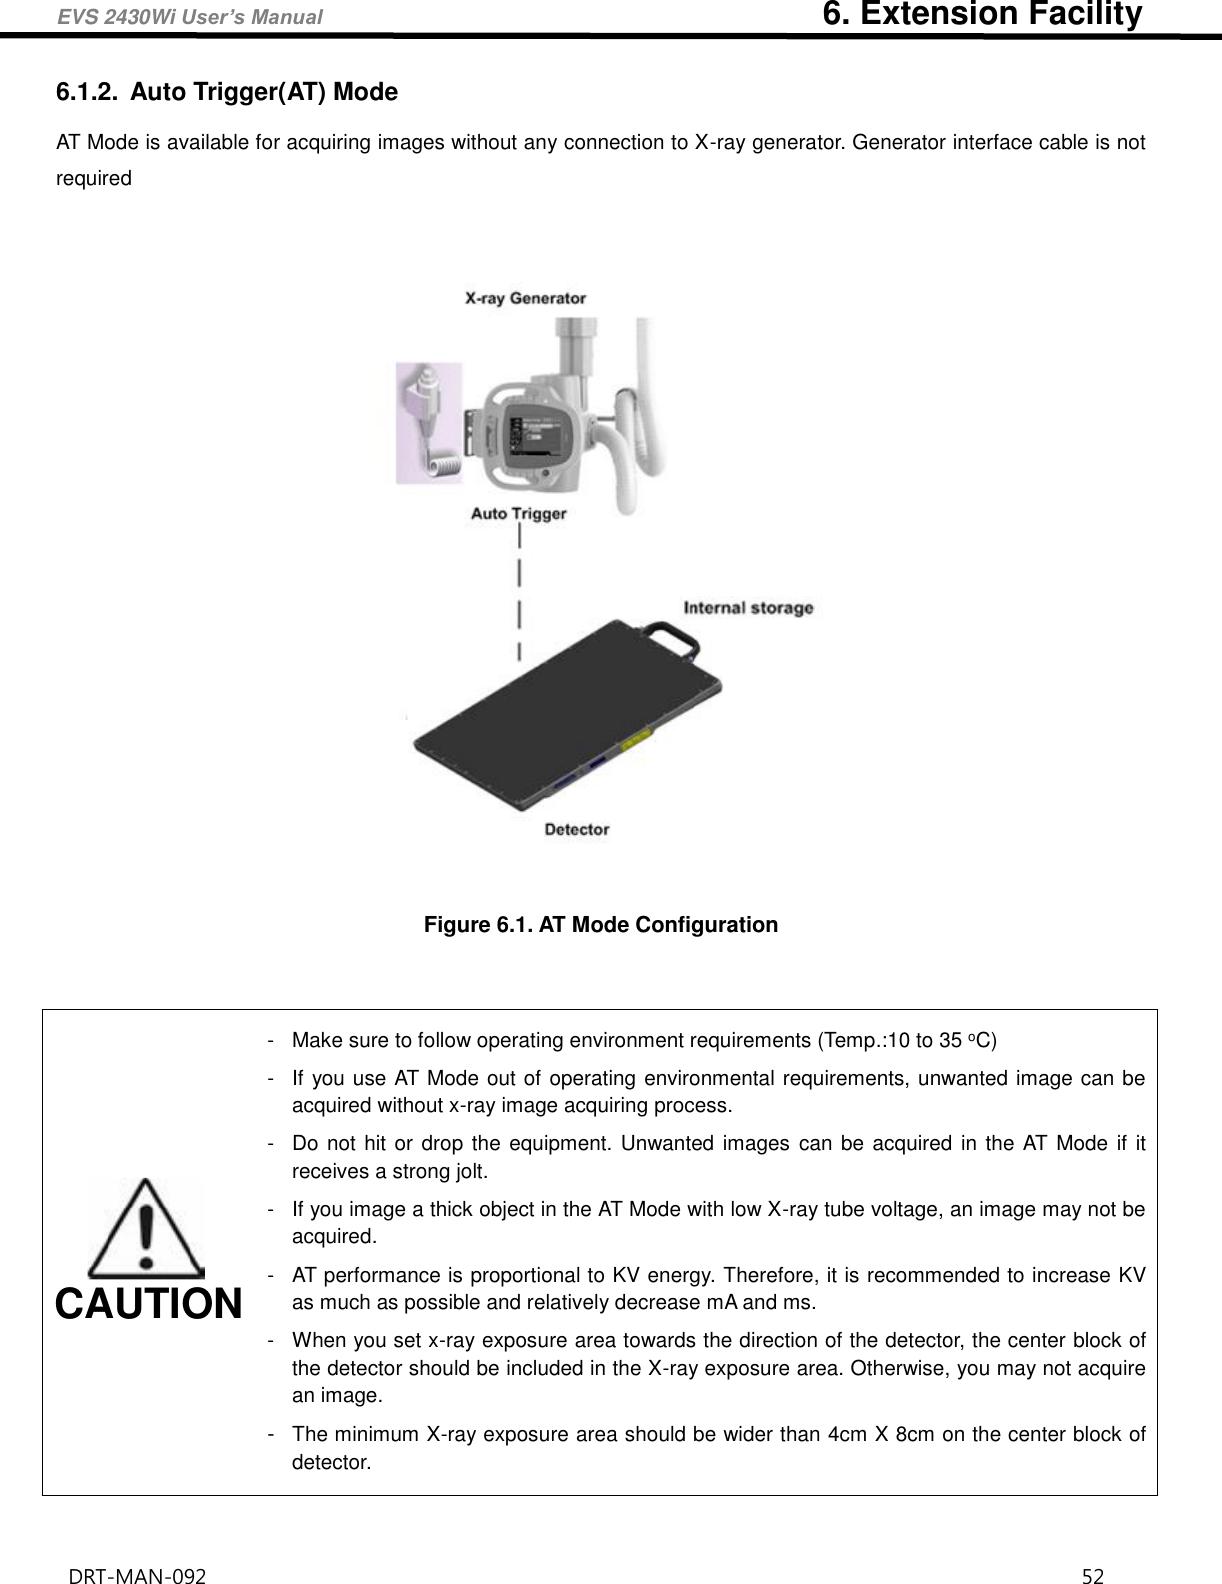 Drtech Evs Wi Flat Panel Digital X Ray Detector User Manual